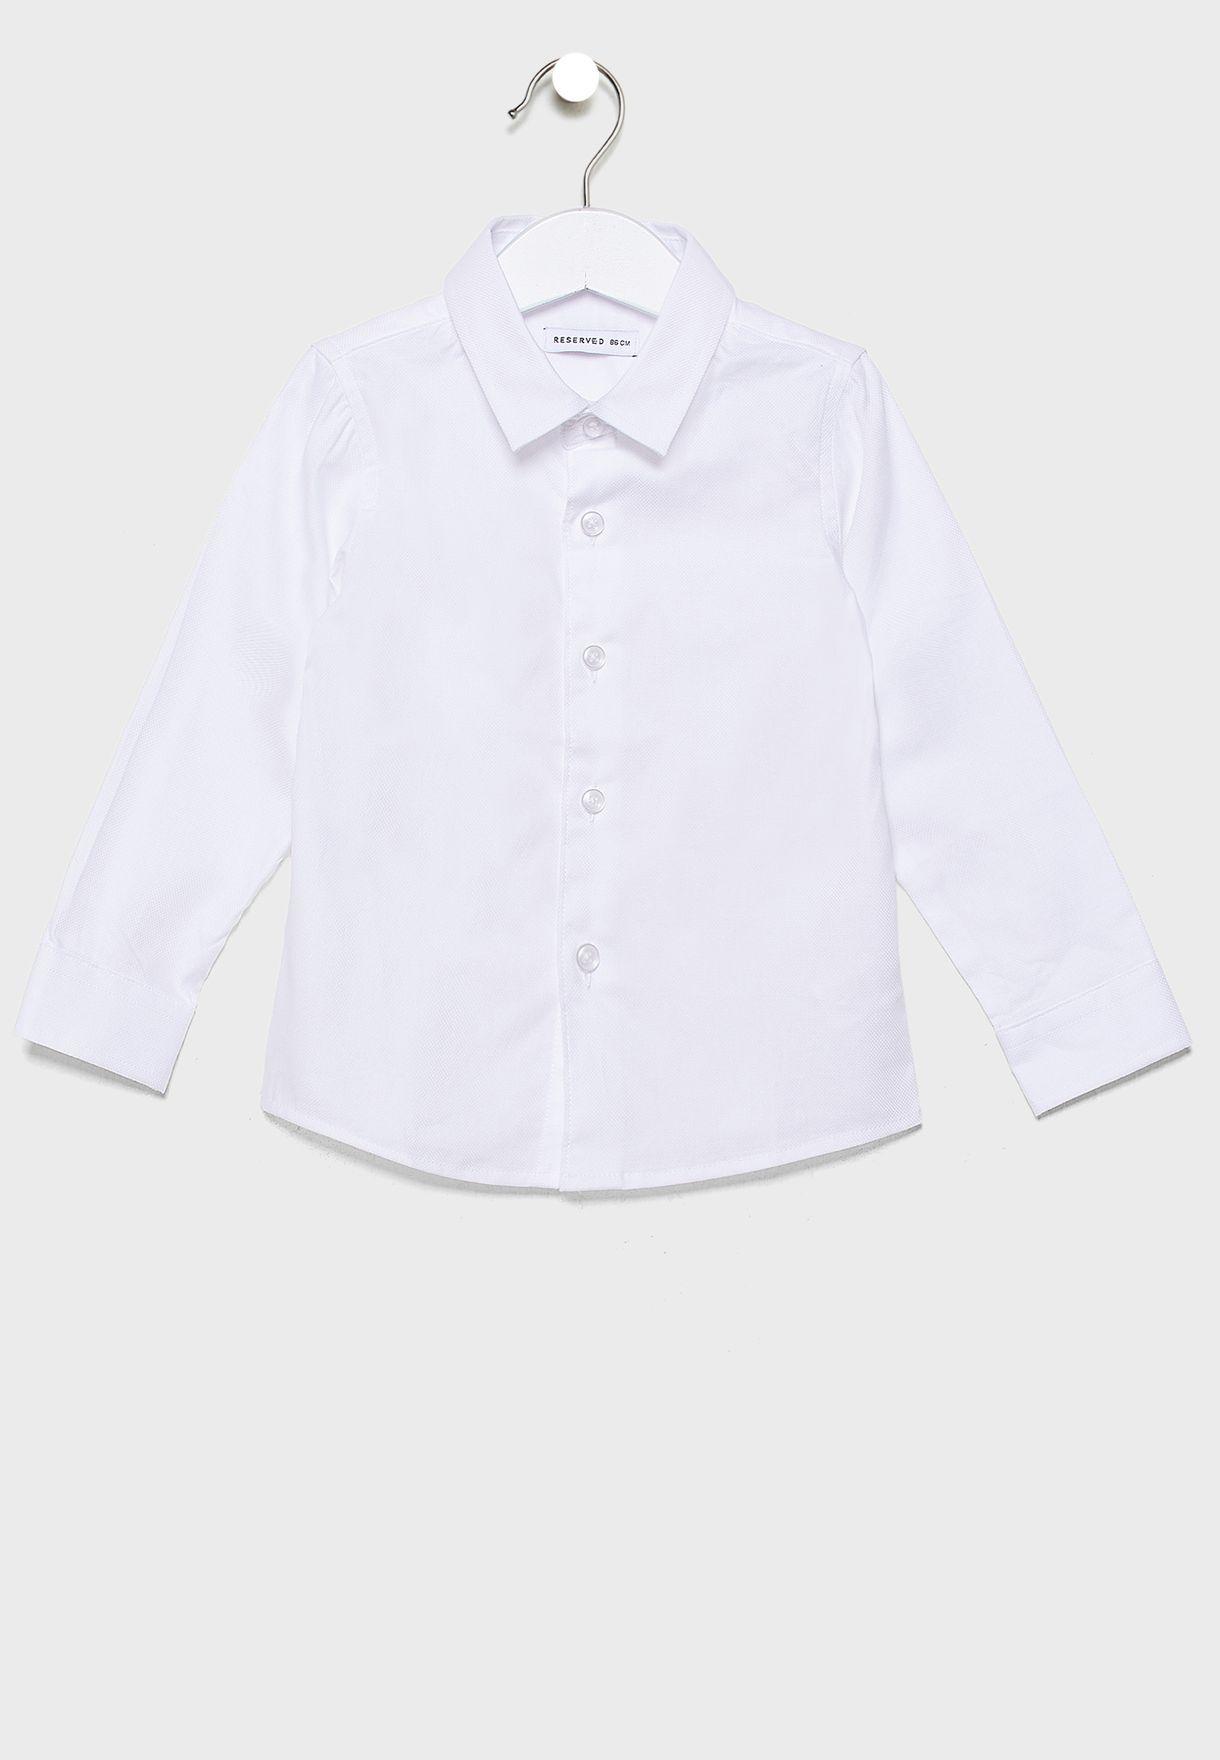 Infant Essential Shirt + Bow Tie